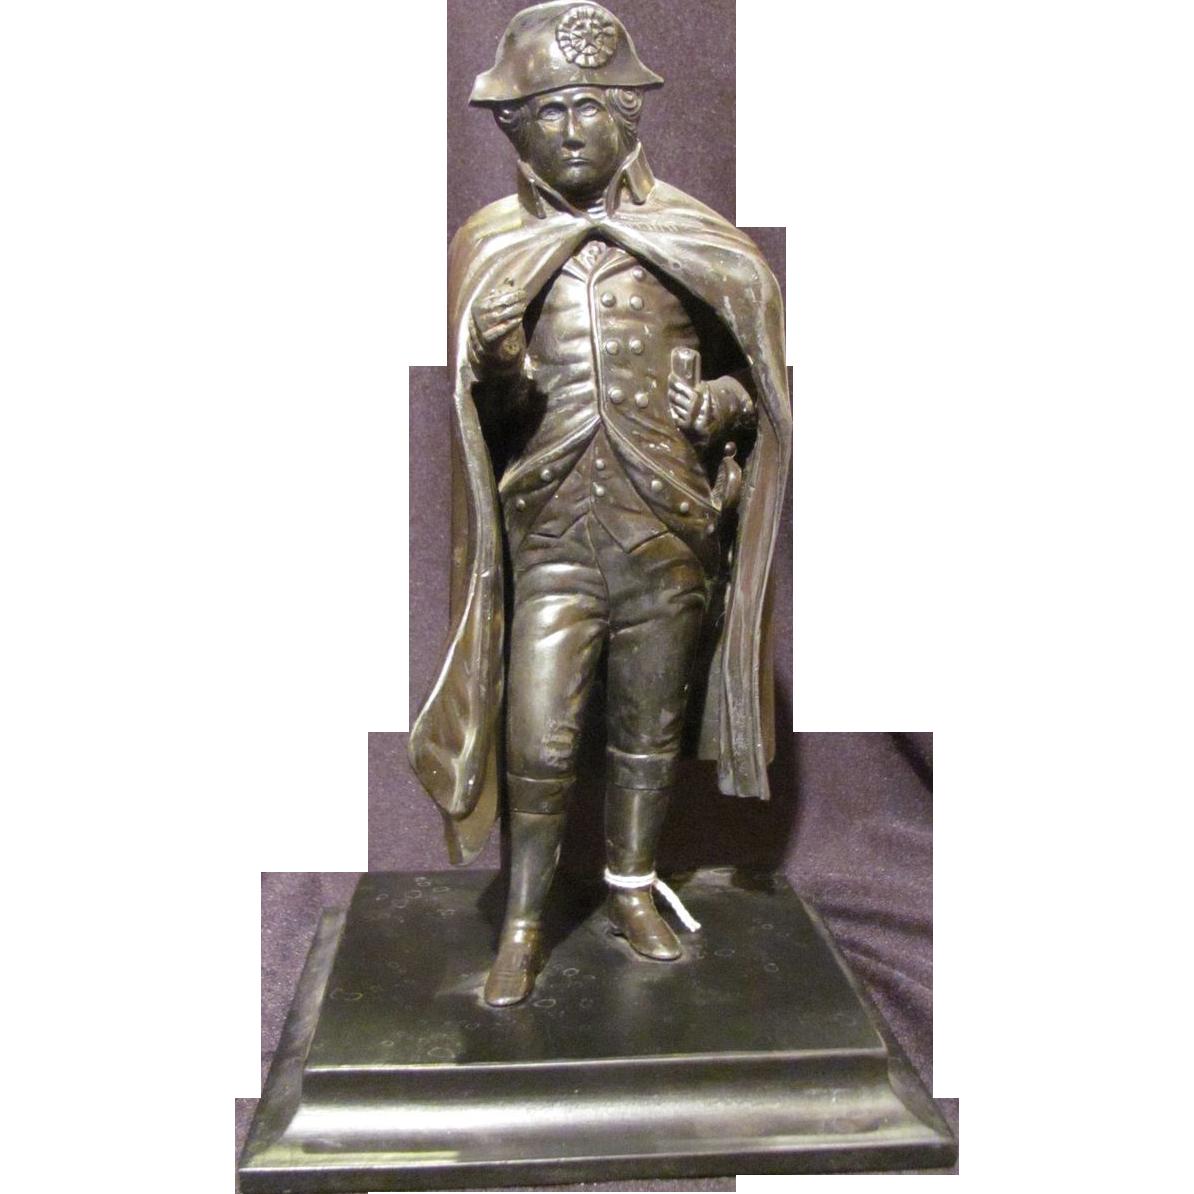 Antique Bronzed Statue Of Napoleon Circa 1900